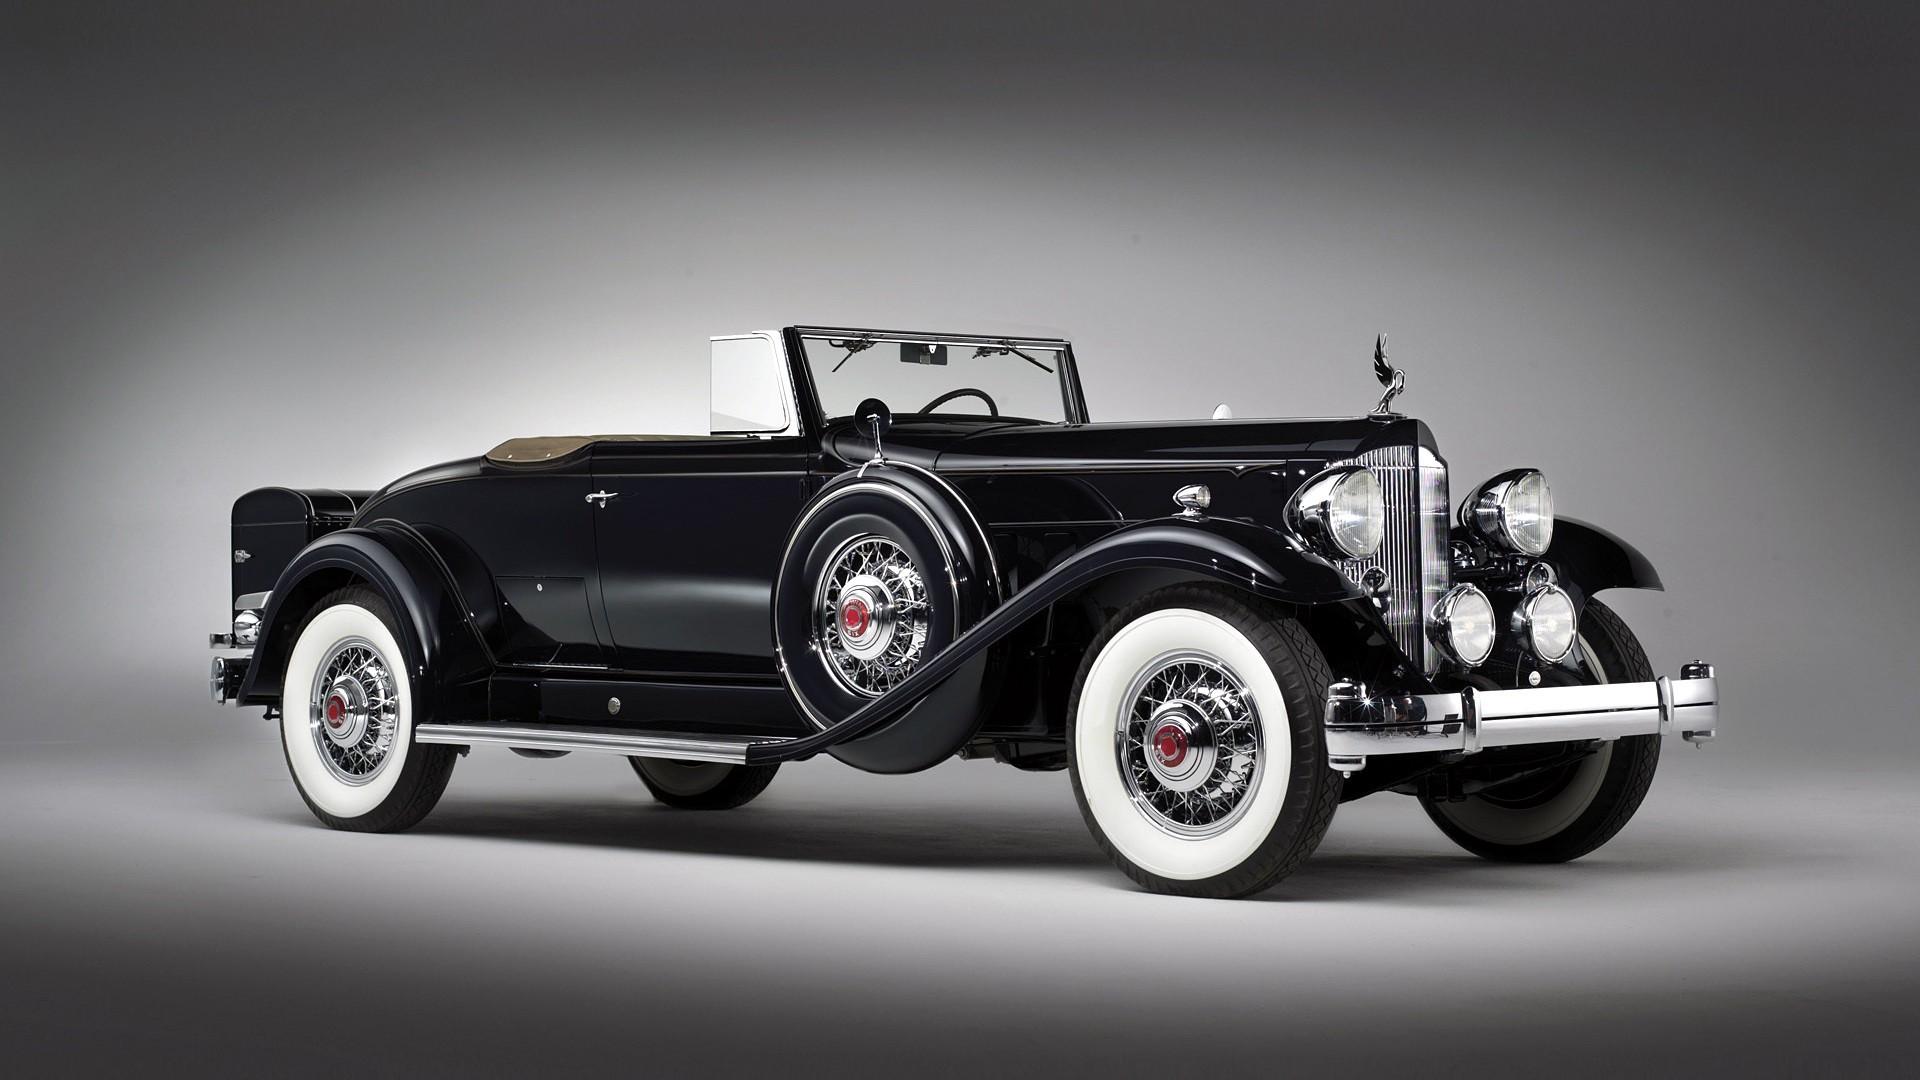 Vintage Cars Wallpaper Vintage, Cars, Classic, Cars